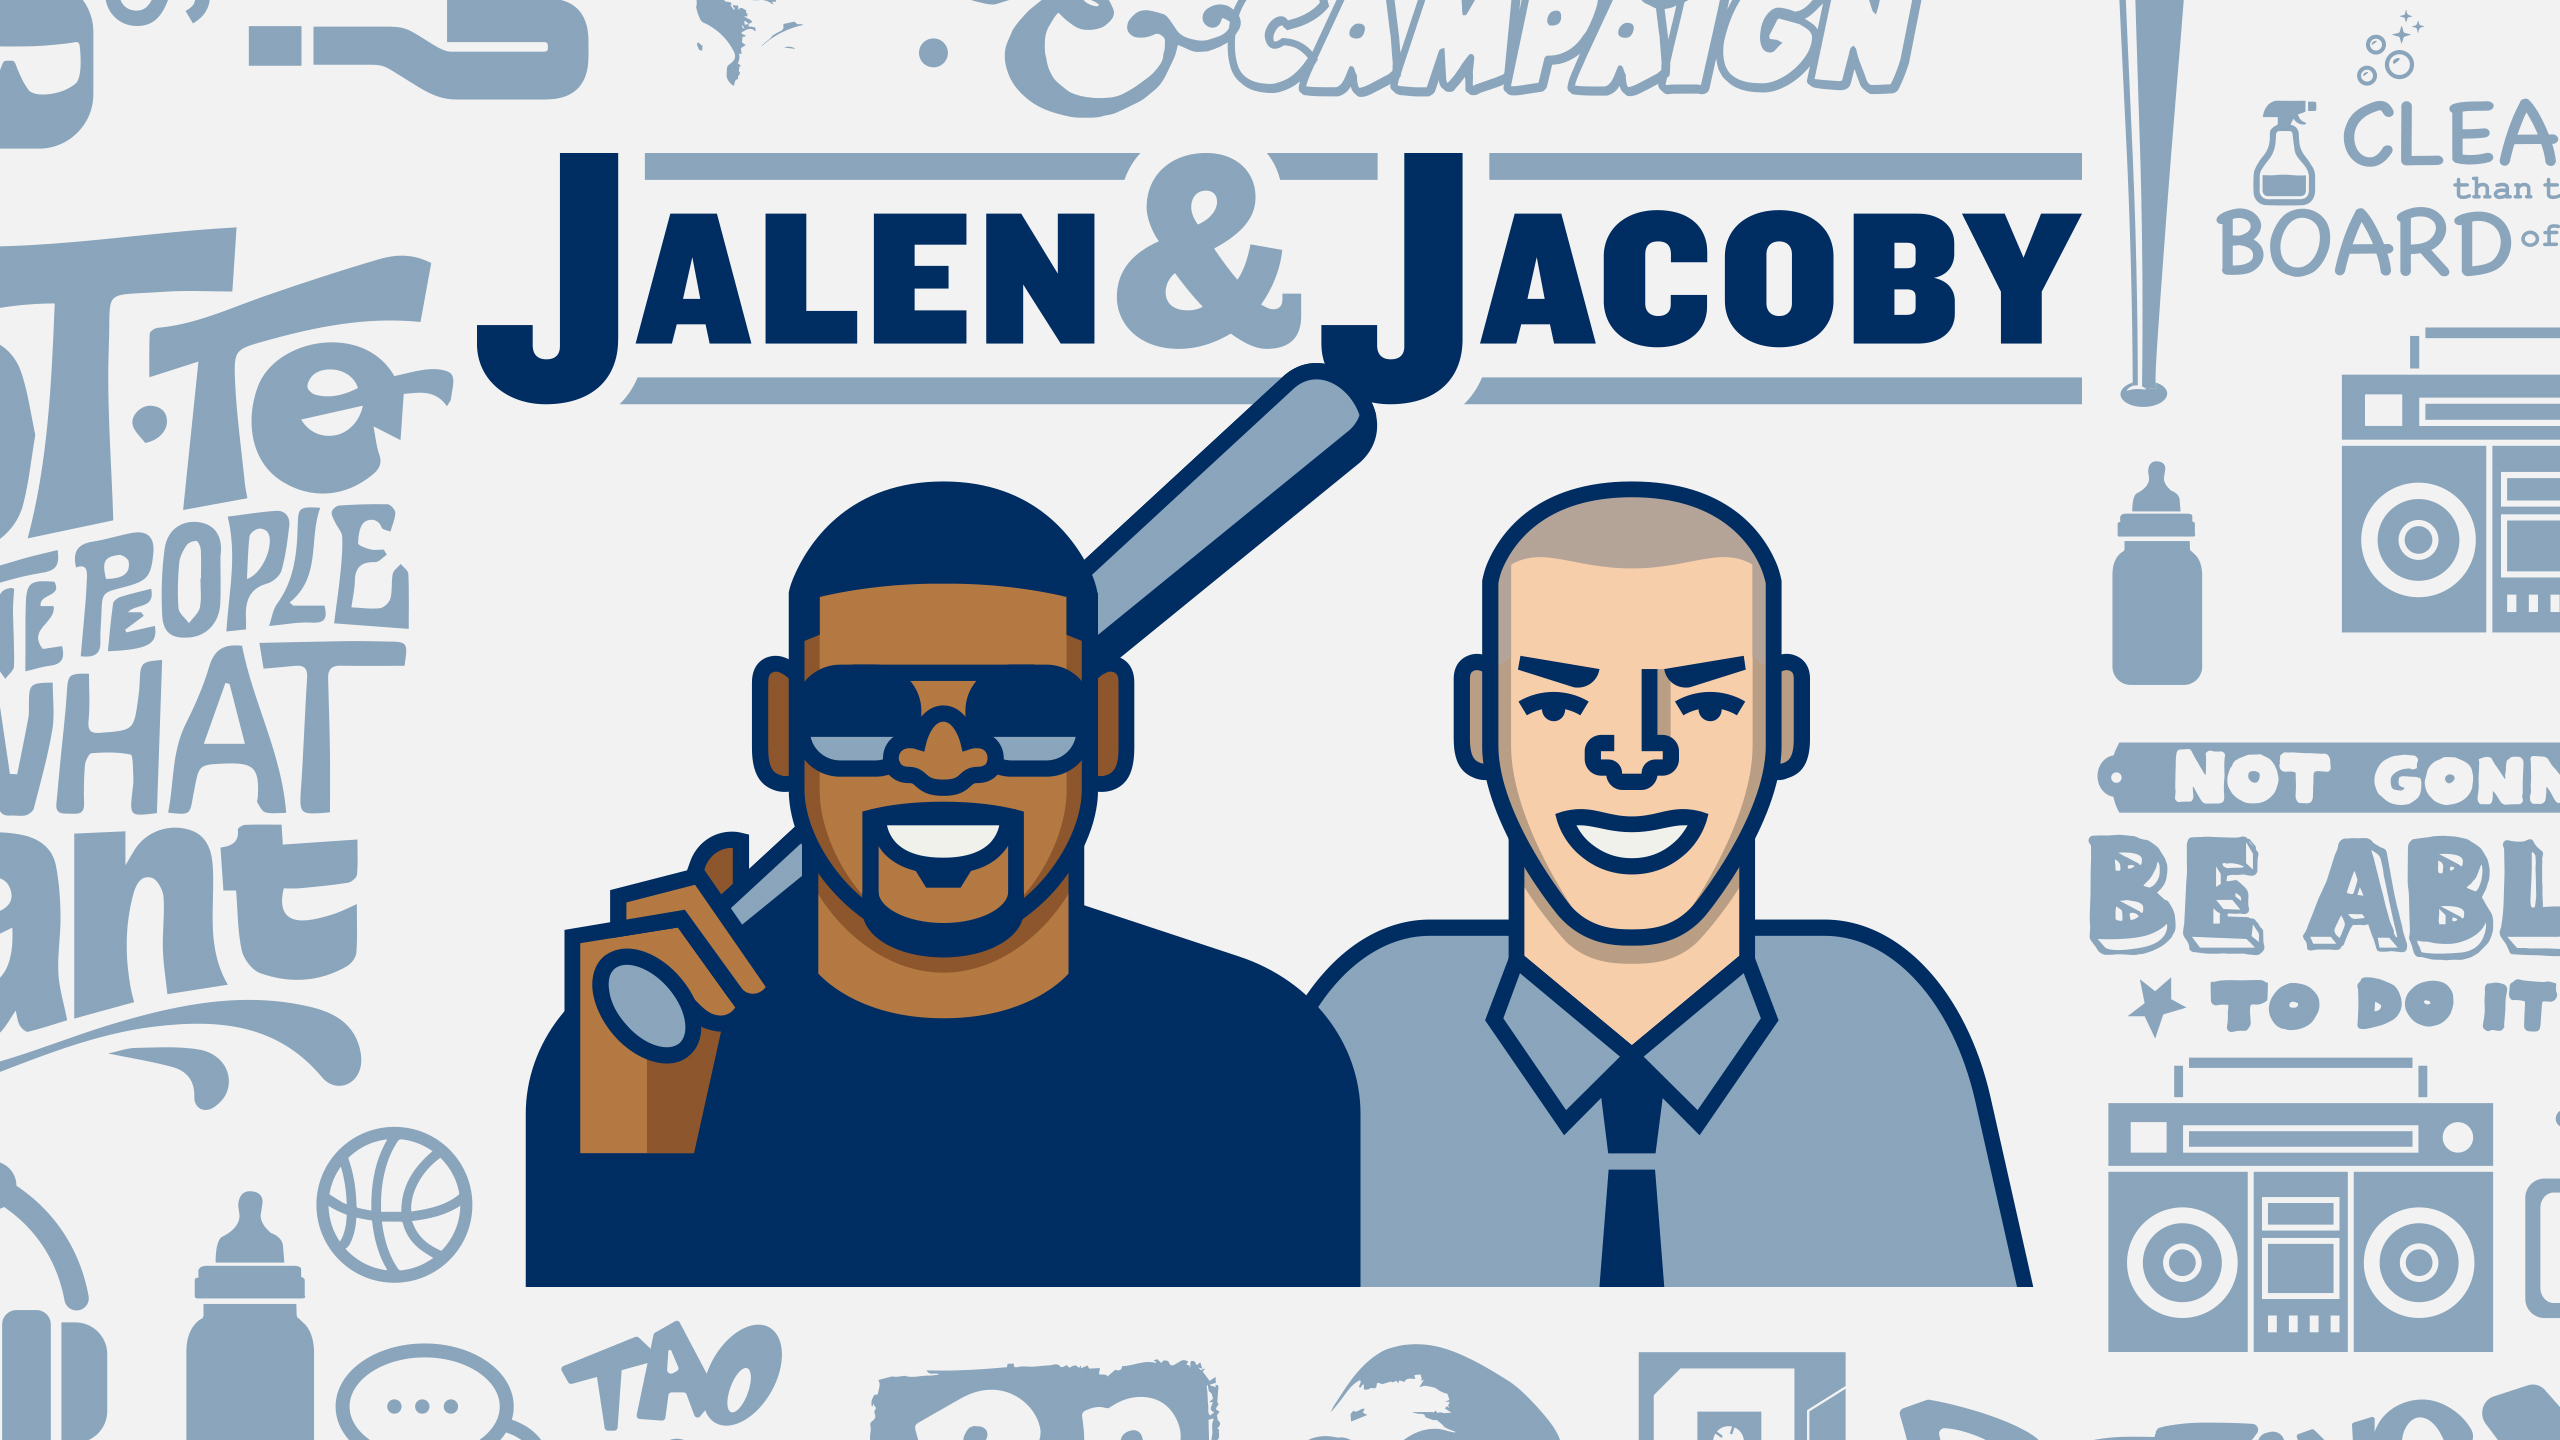 Mon, 10/22 - Jalen & Jacoby